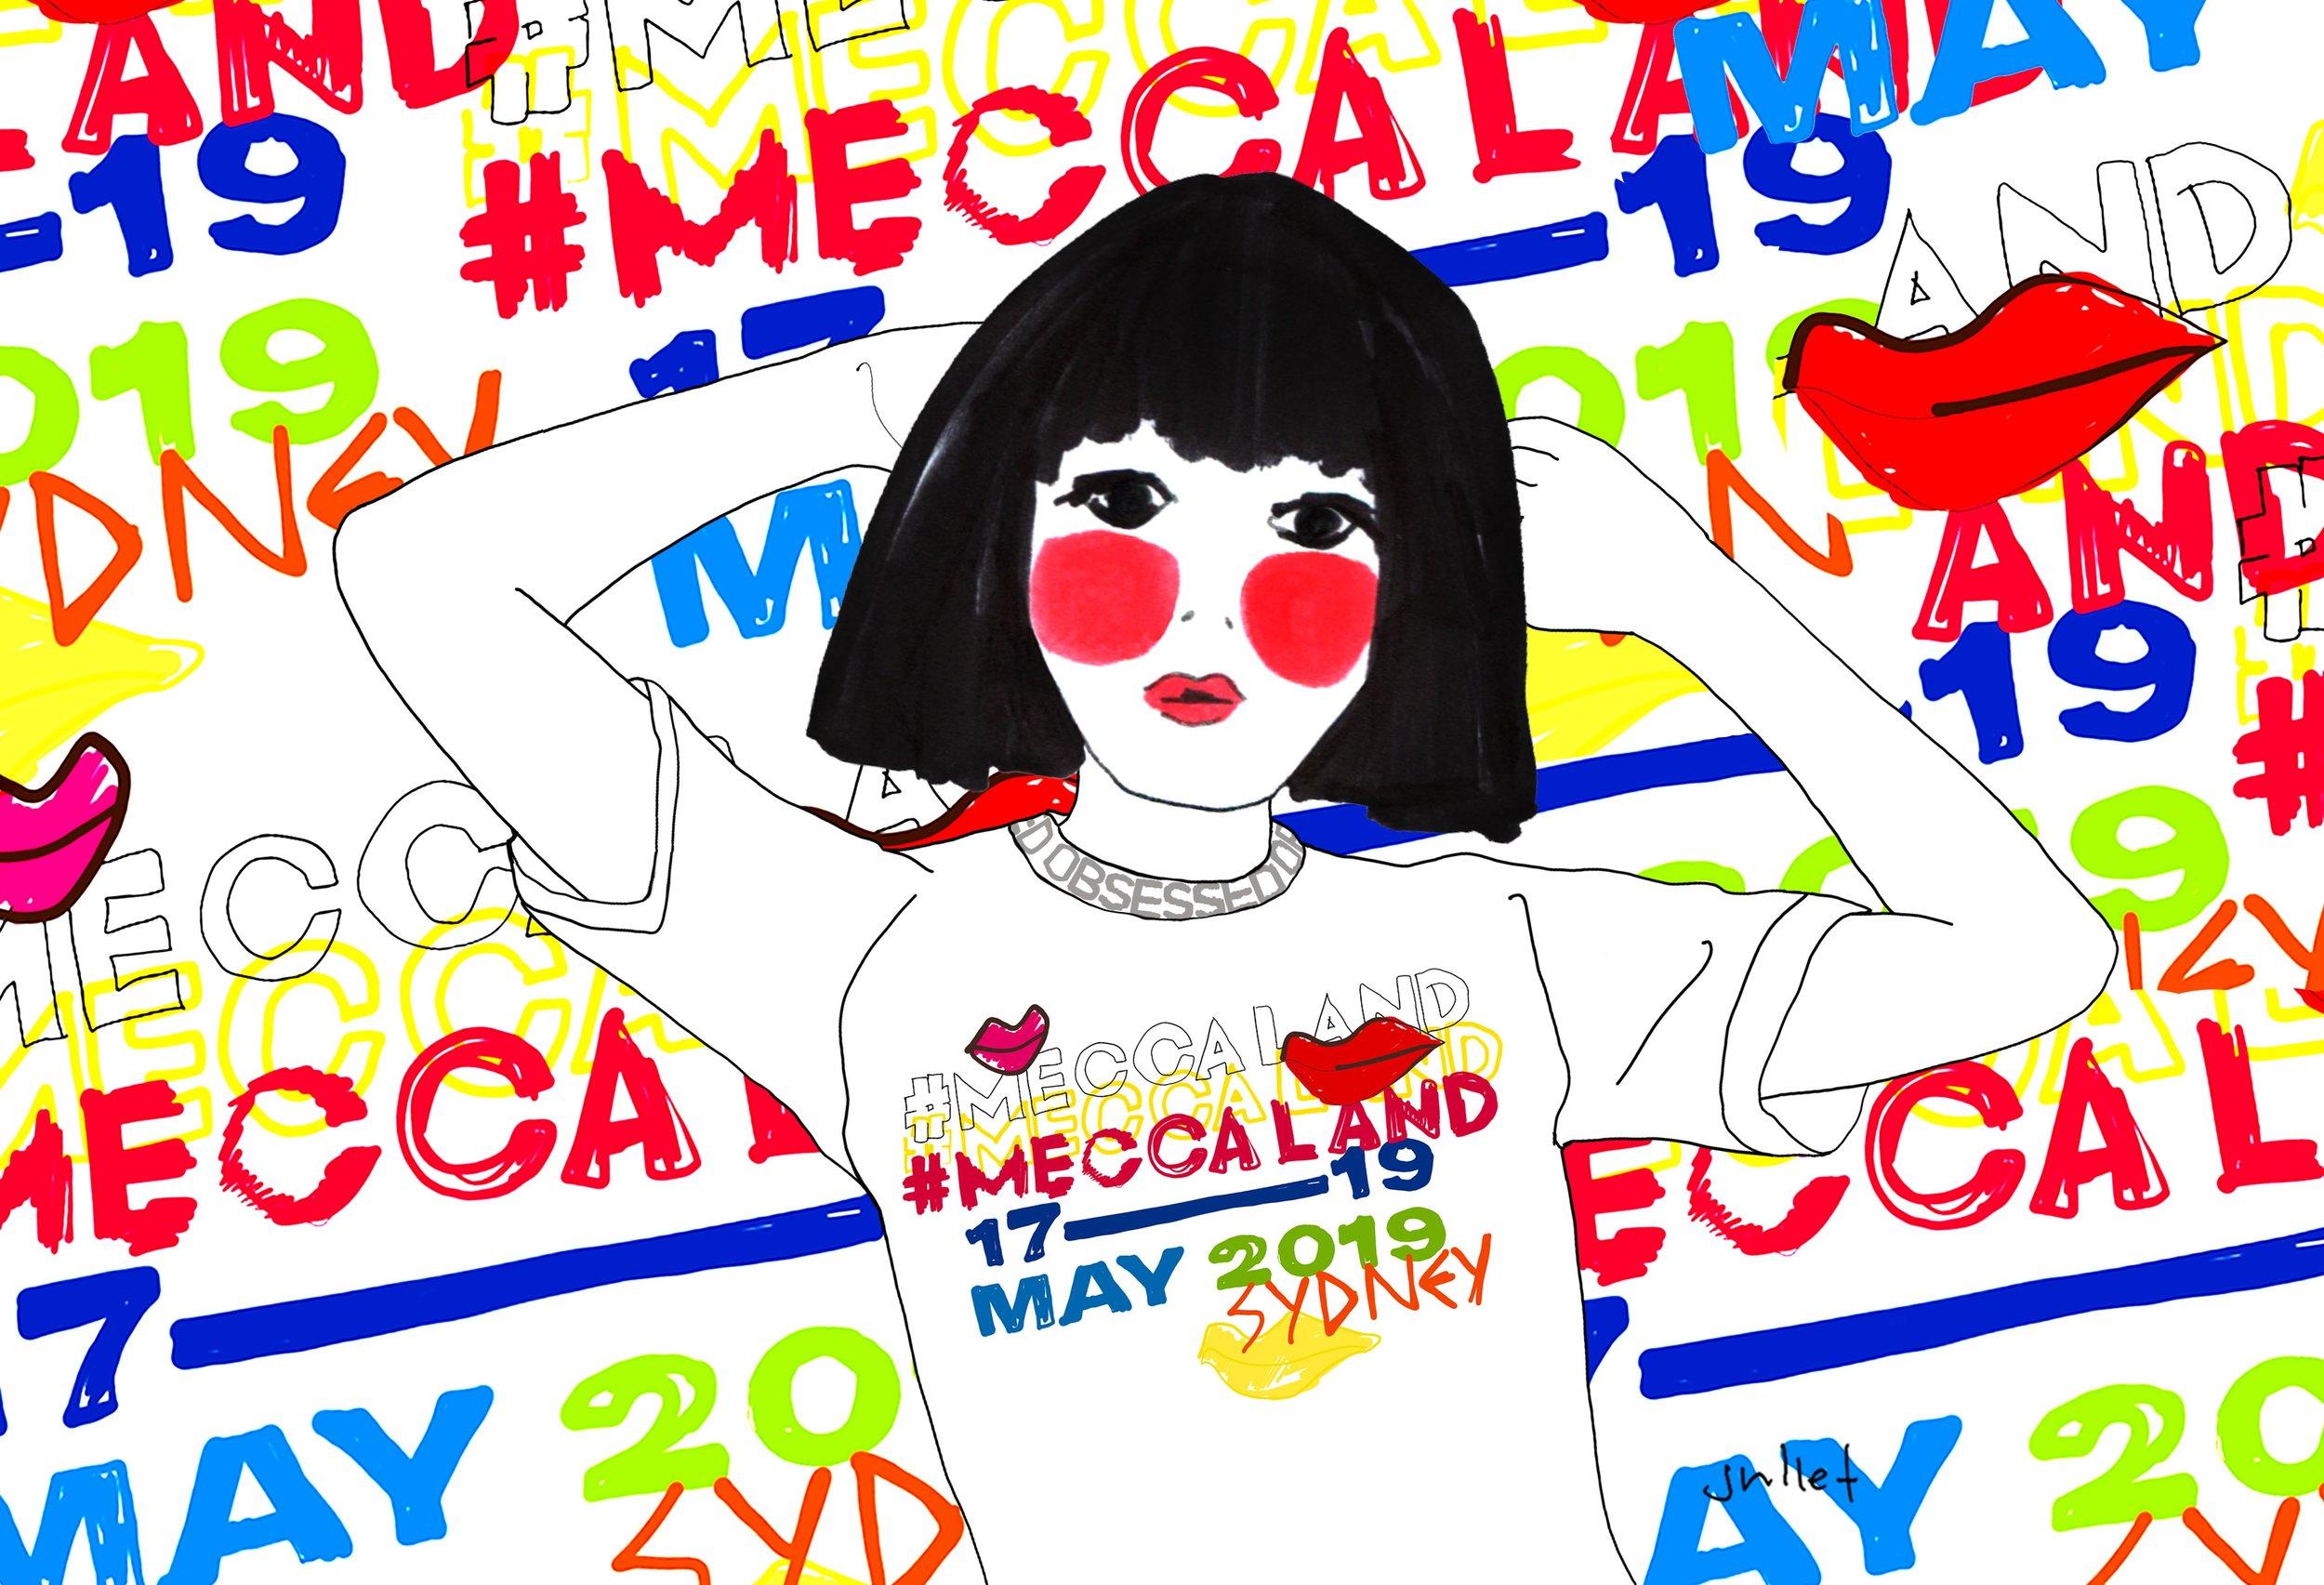 #meccaland 2.0 2019 sydney